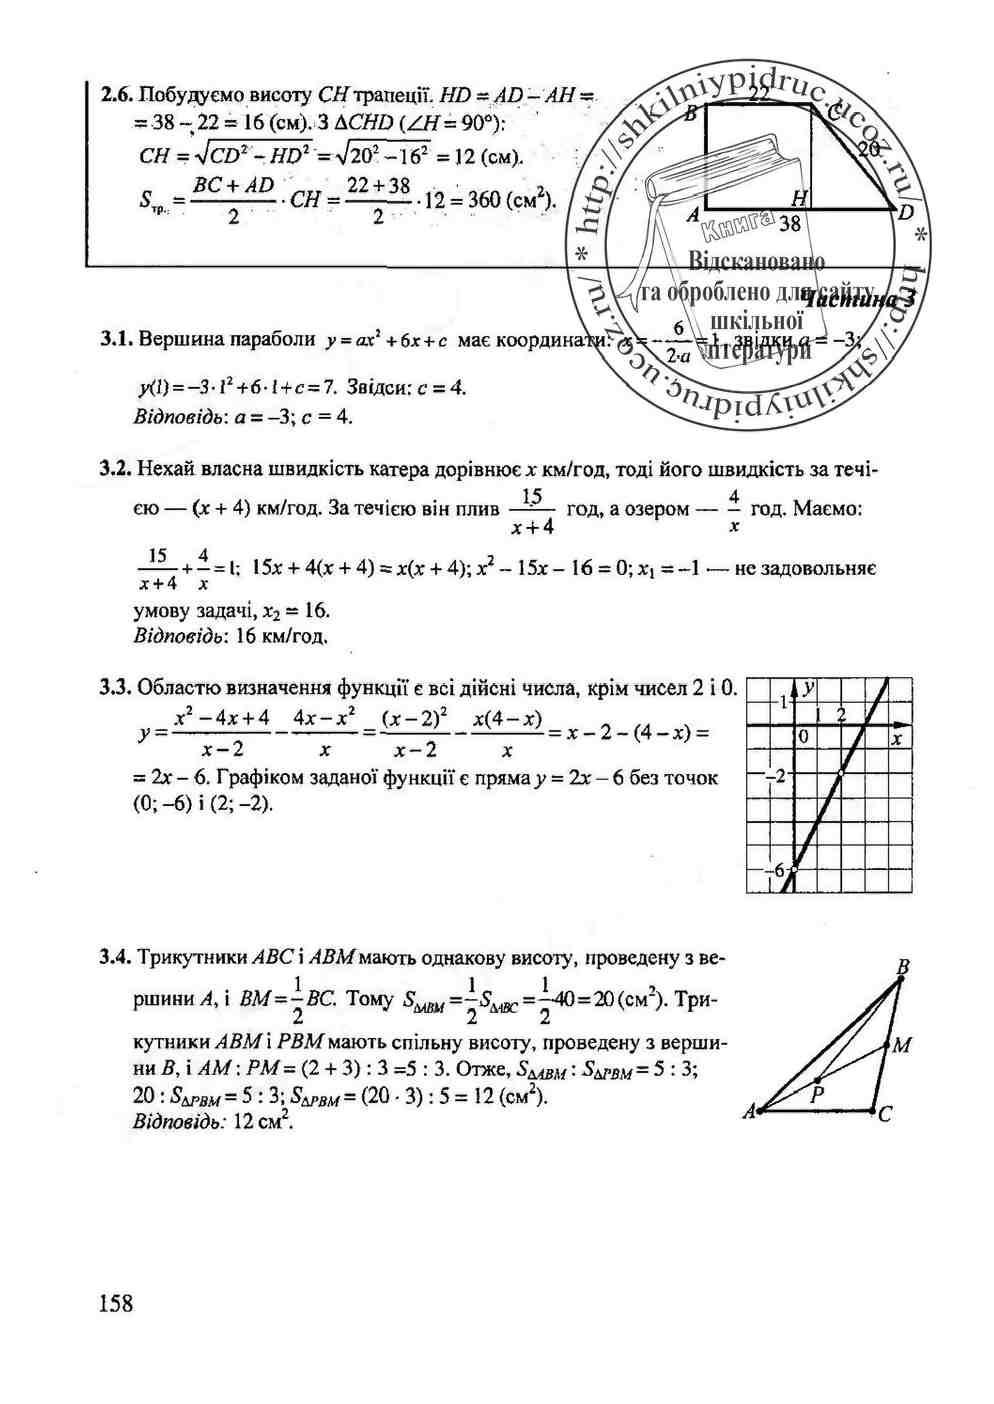 9 клас дпа с математики решебник